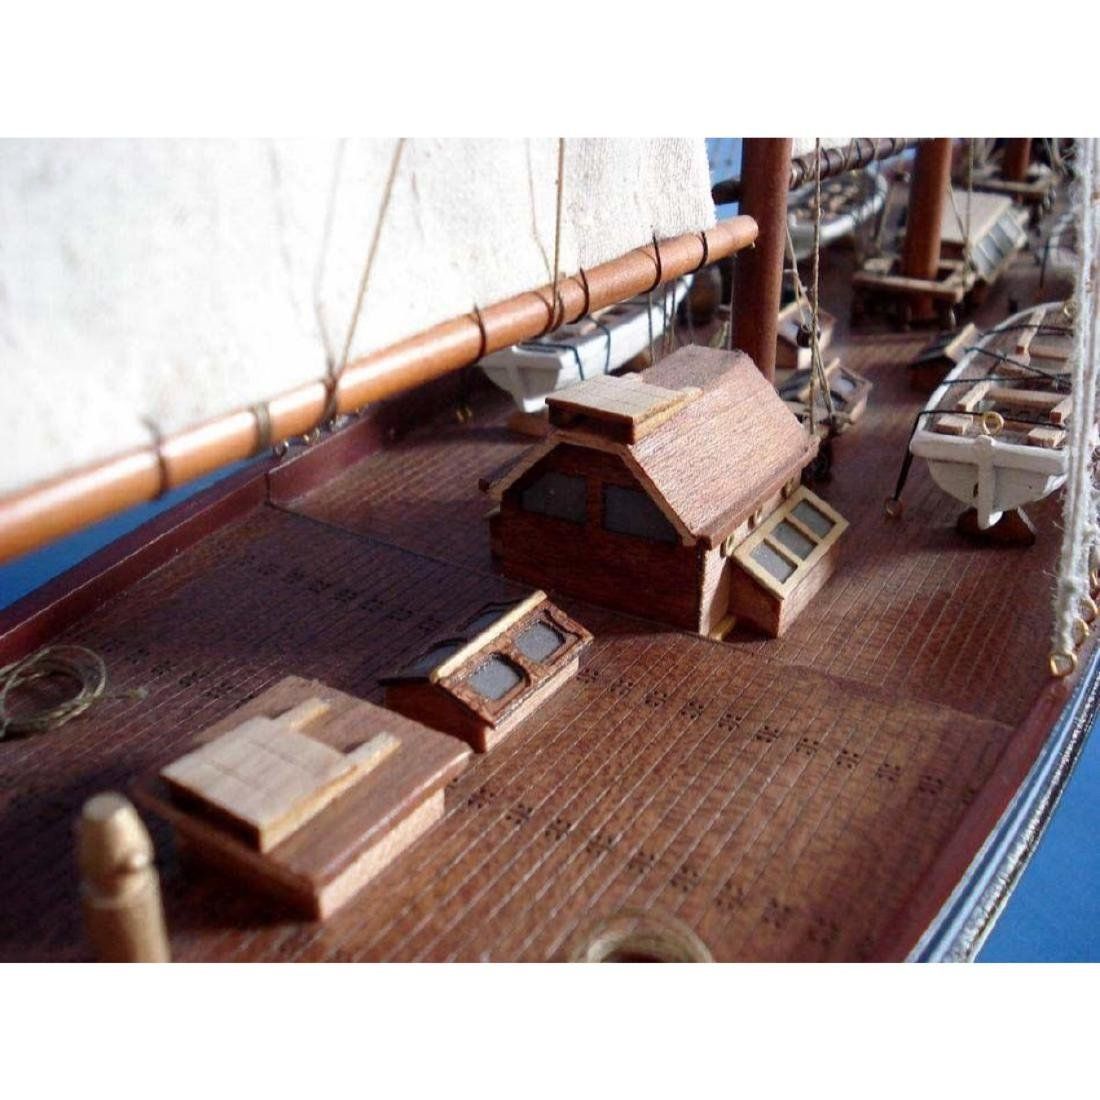 "Wooden Atlantic Limited Model Sailboat 32"" - 3"